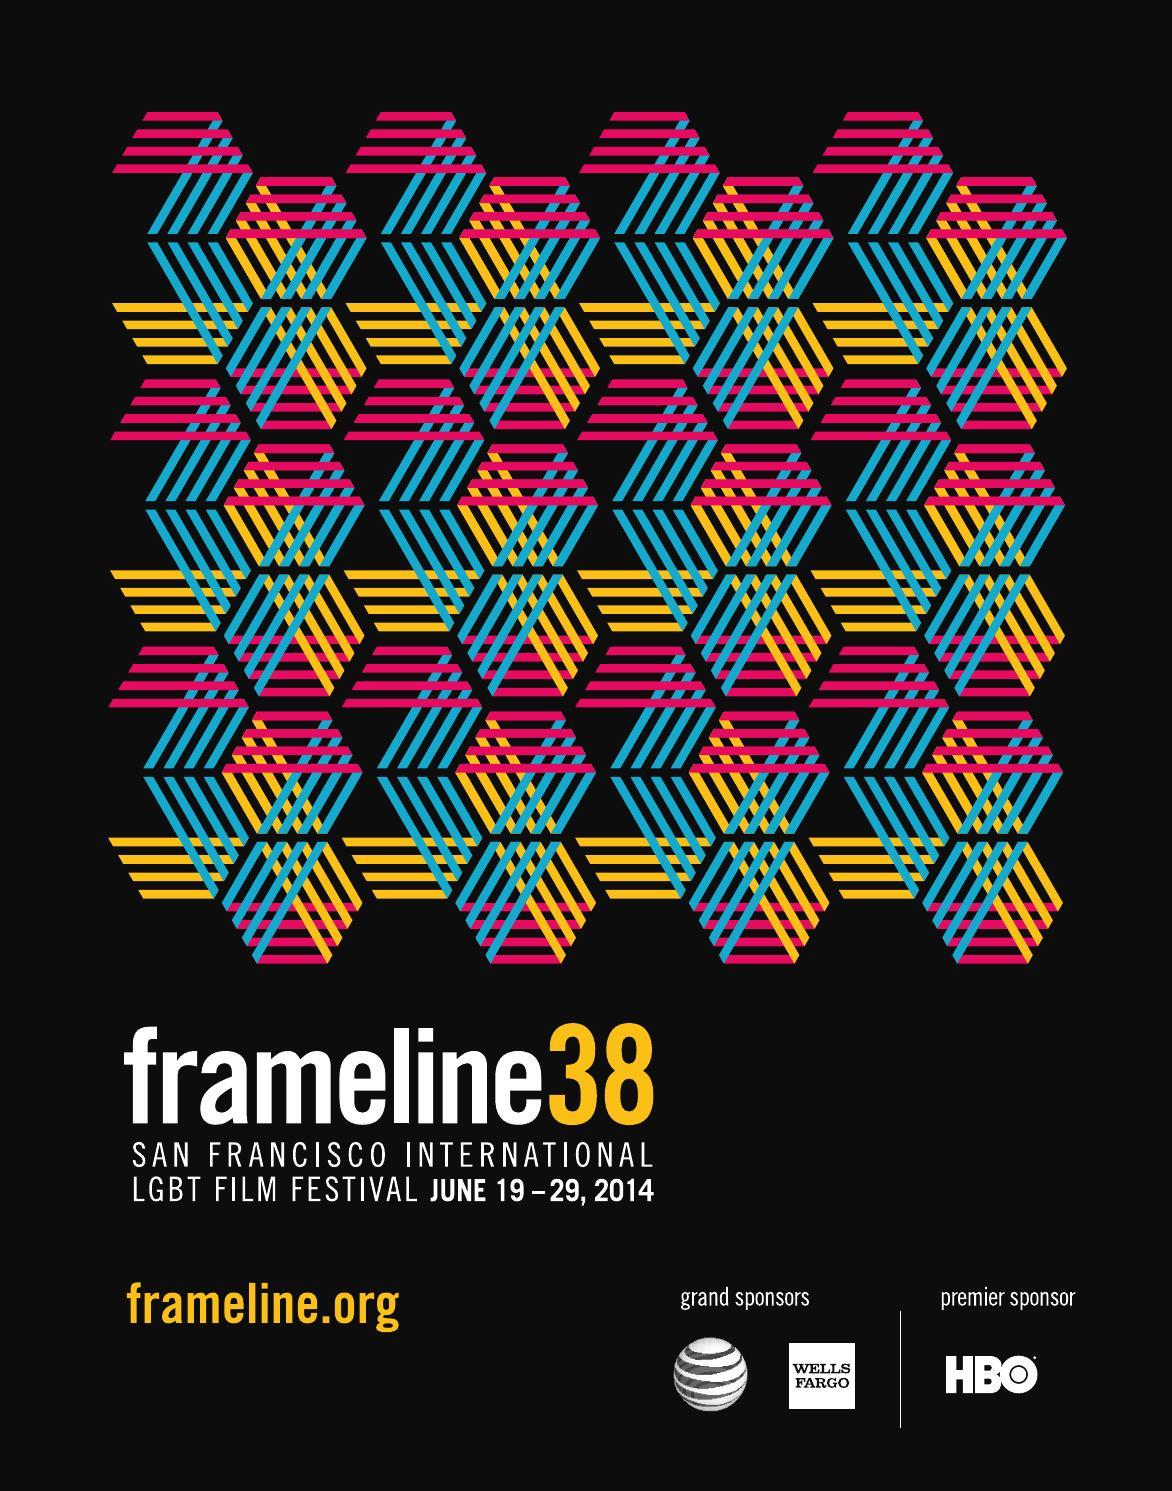 Frameline38 San Francisco International LGBT Film Festival By Frameline